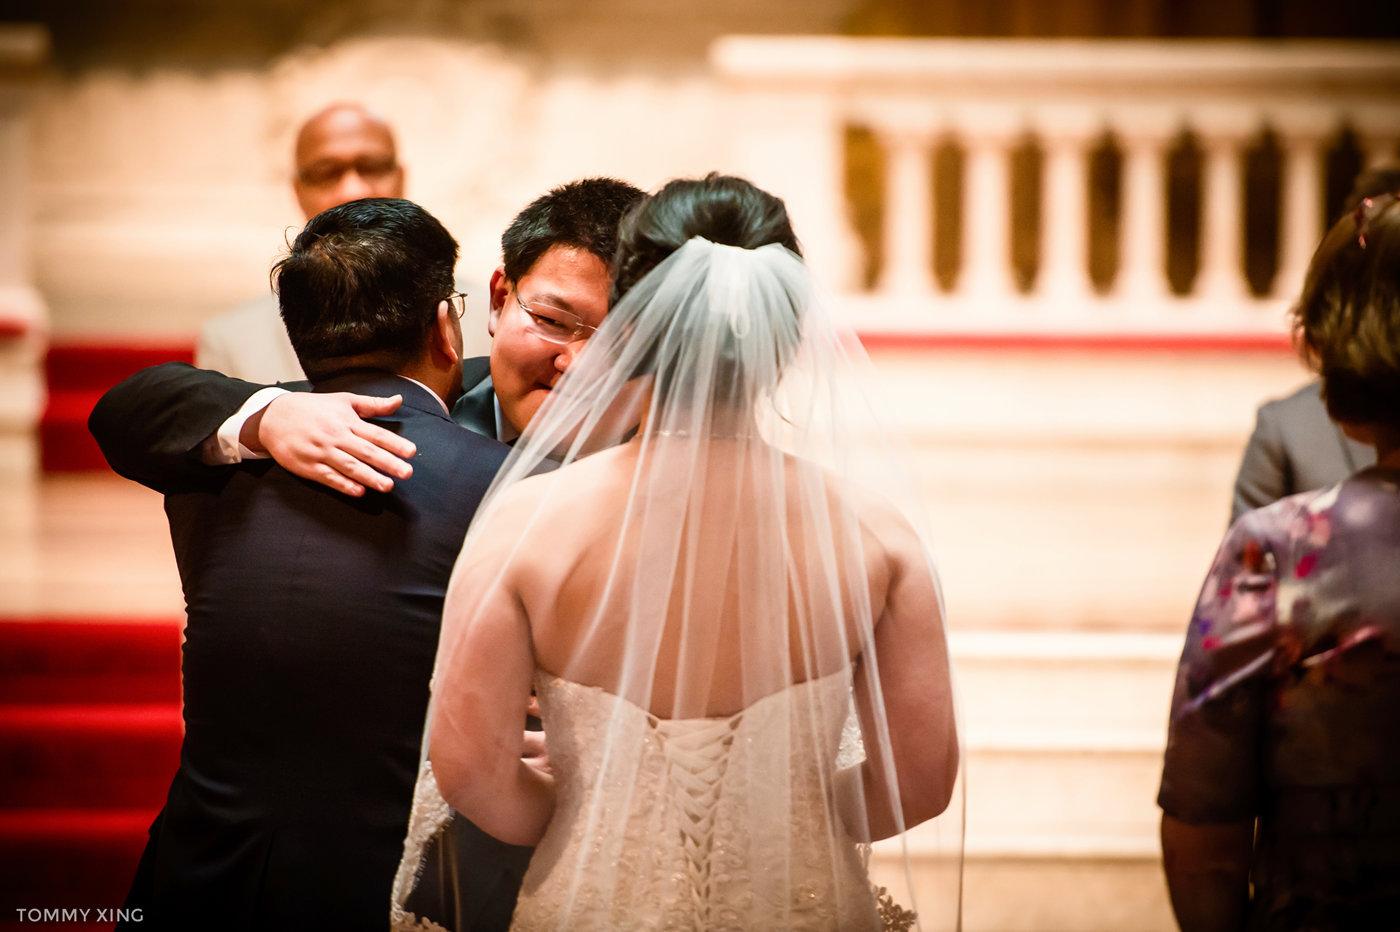 STANFORD MEMORIAL CHURCH WEDDING - Wenjie & Chengcheng - SAN FRANCISCO BAY AREA 斯坦福教堂婚礼跟拍 - 洛杉矶婚礼婚纱照摄影师 Tommy Xing Photography084.jpg